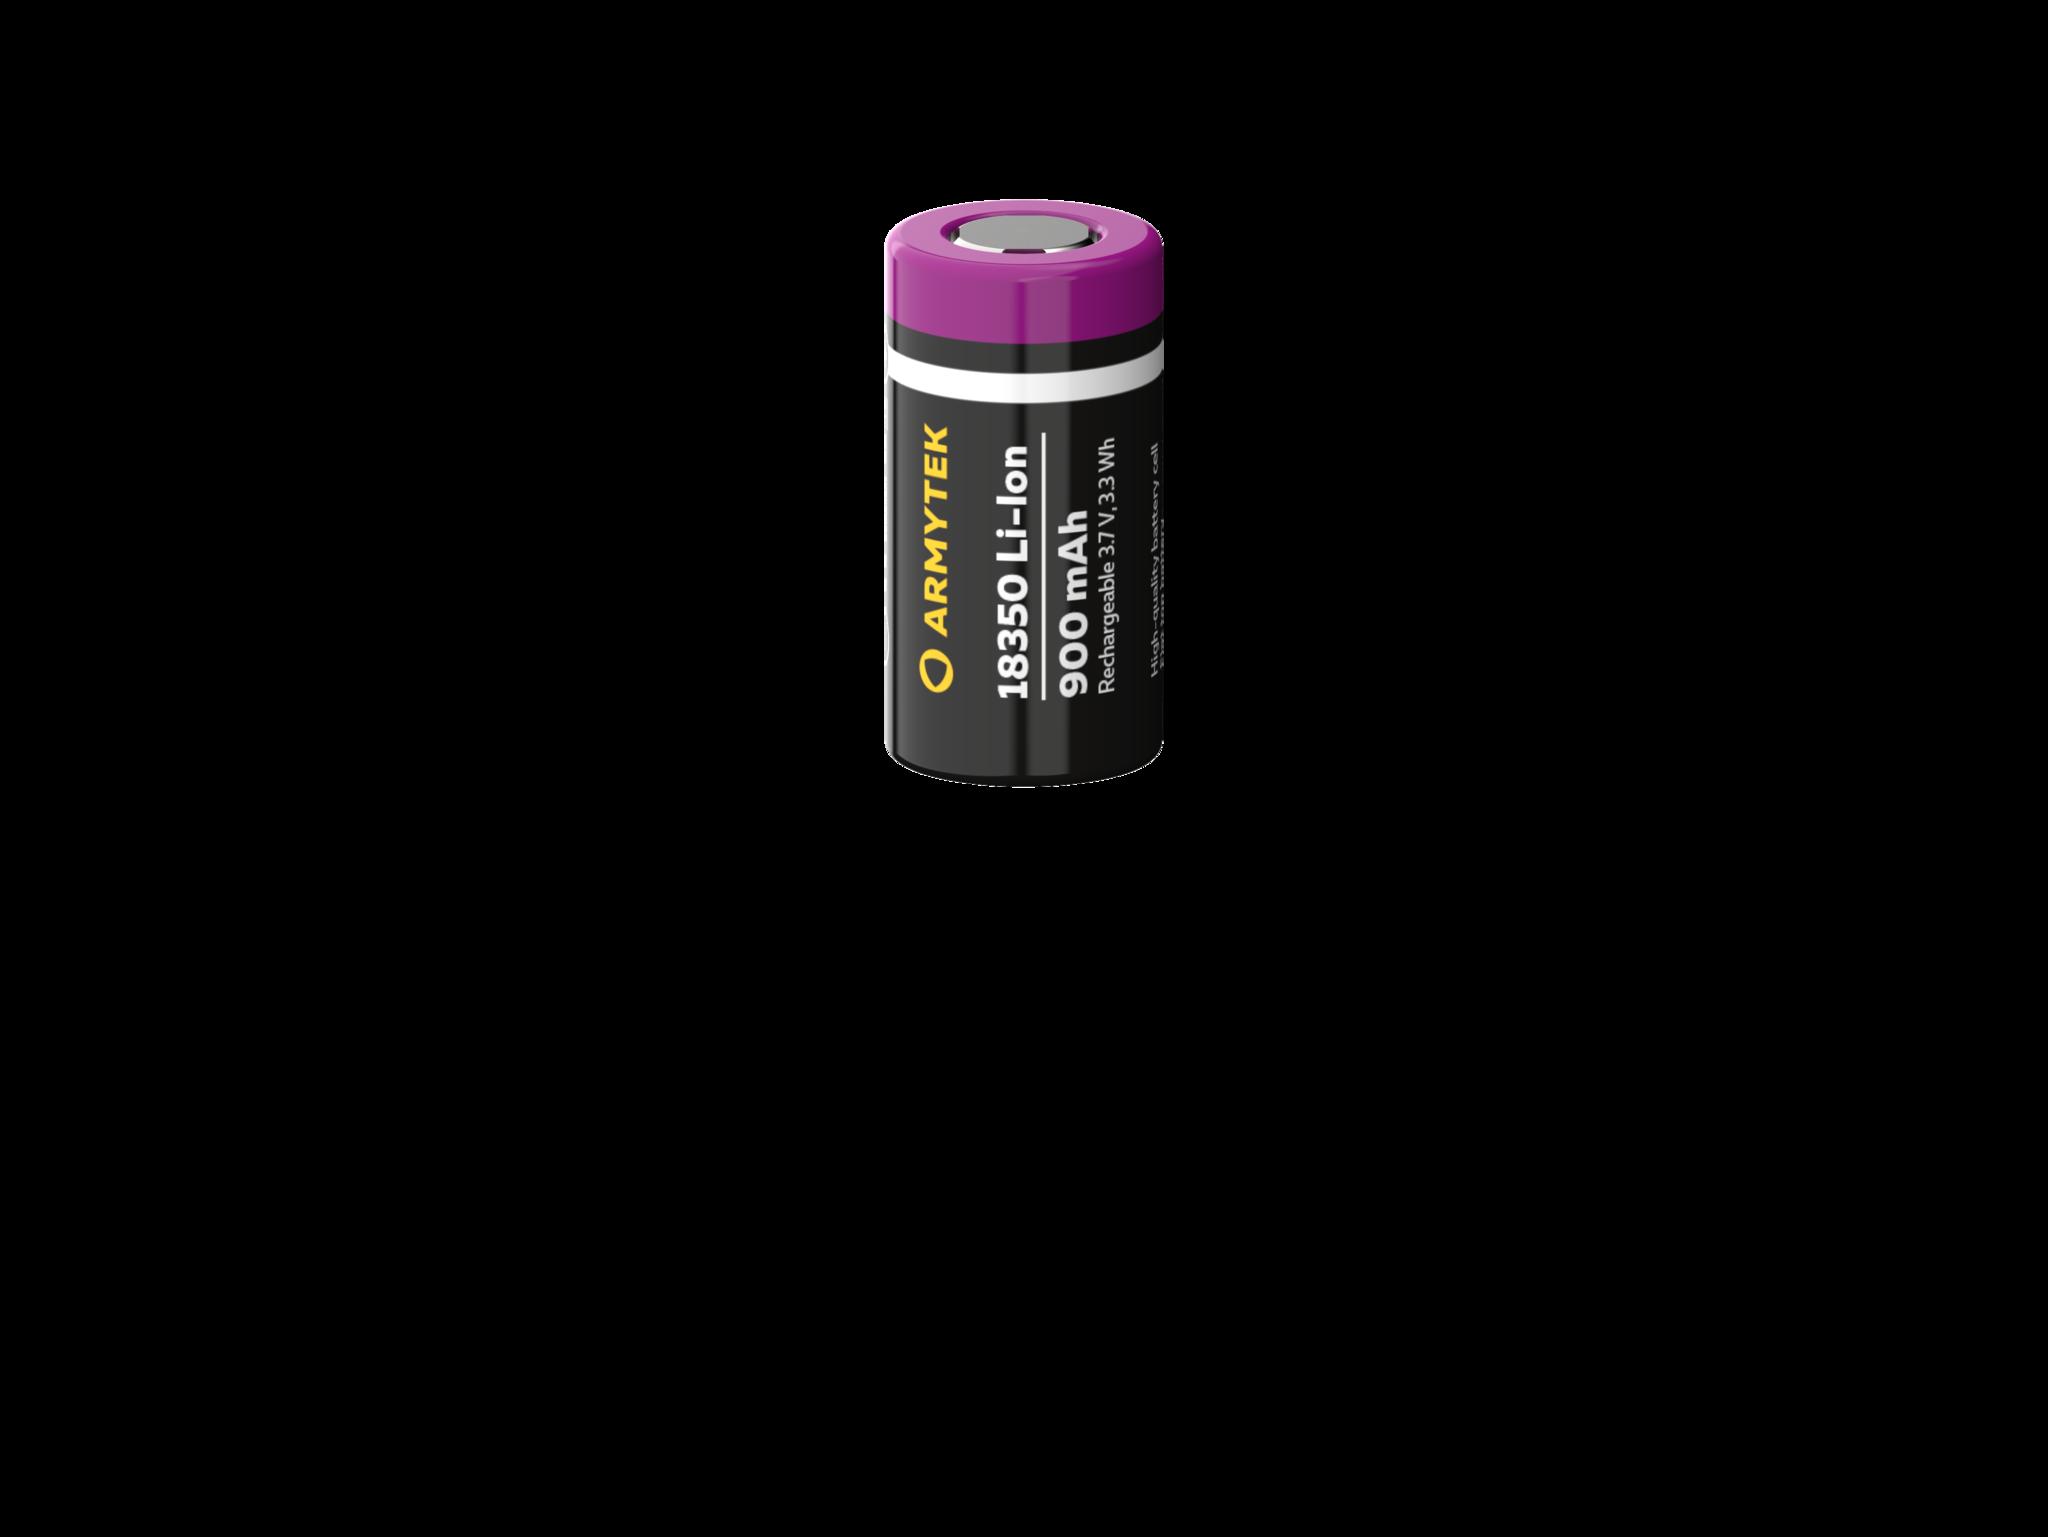 Аккумулятор Armytek 18350 Li-Ion 900 mAh. Незащищённый - фото 1